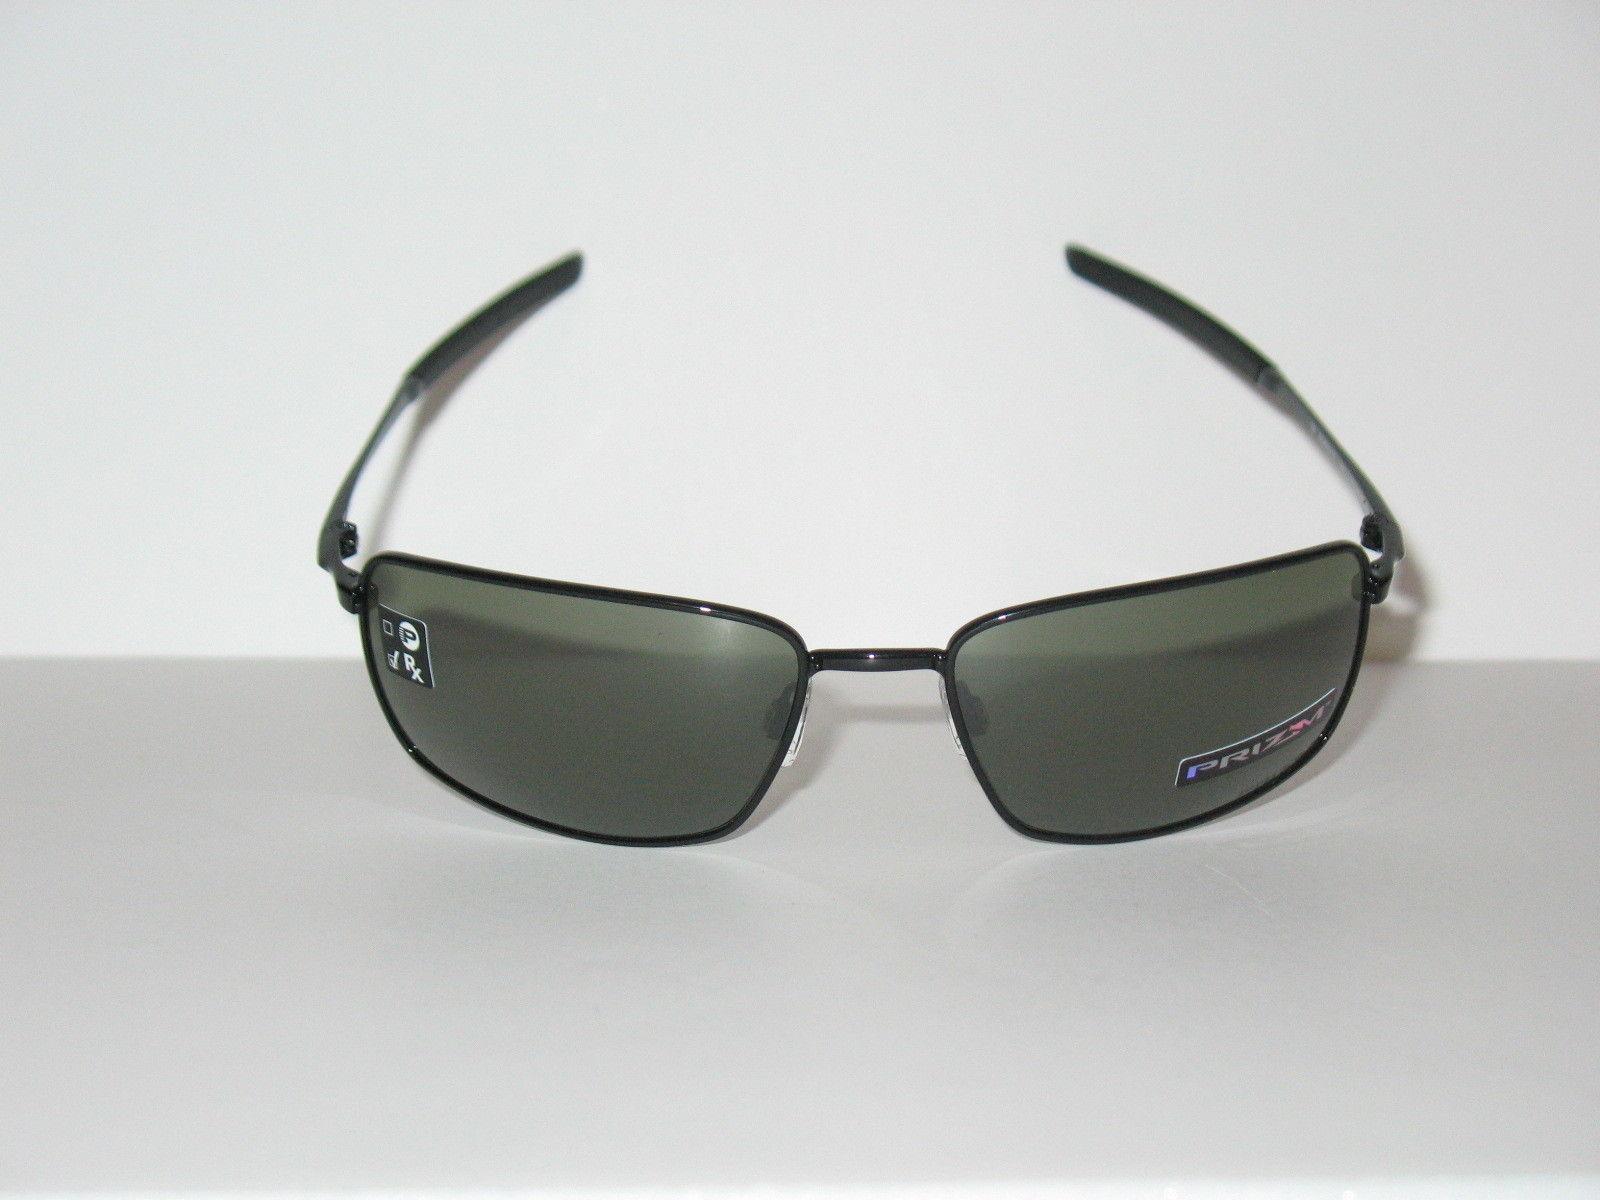 b8898a4b0b8 57. 57. Previous. Oakley Square Wire Sunglasses OO4075-1360 Polished Black